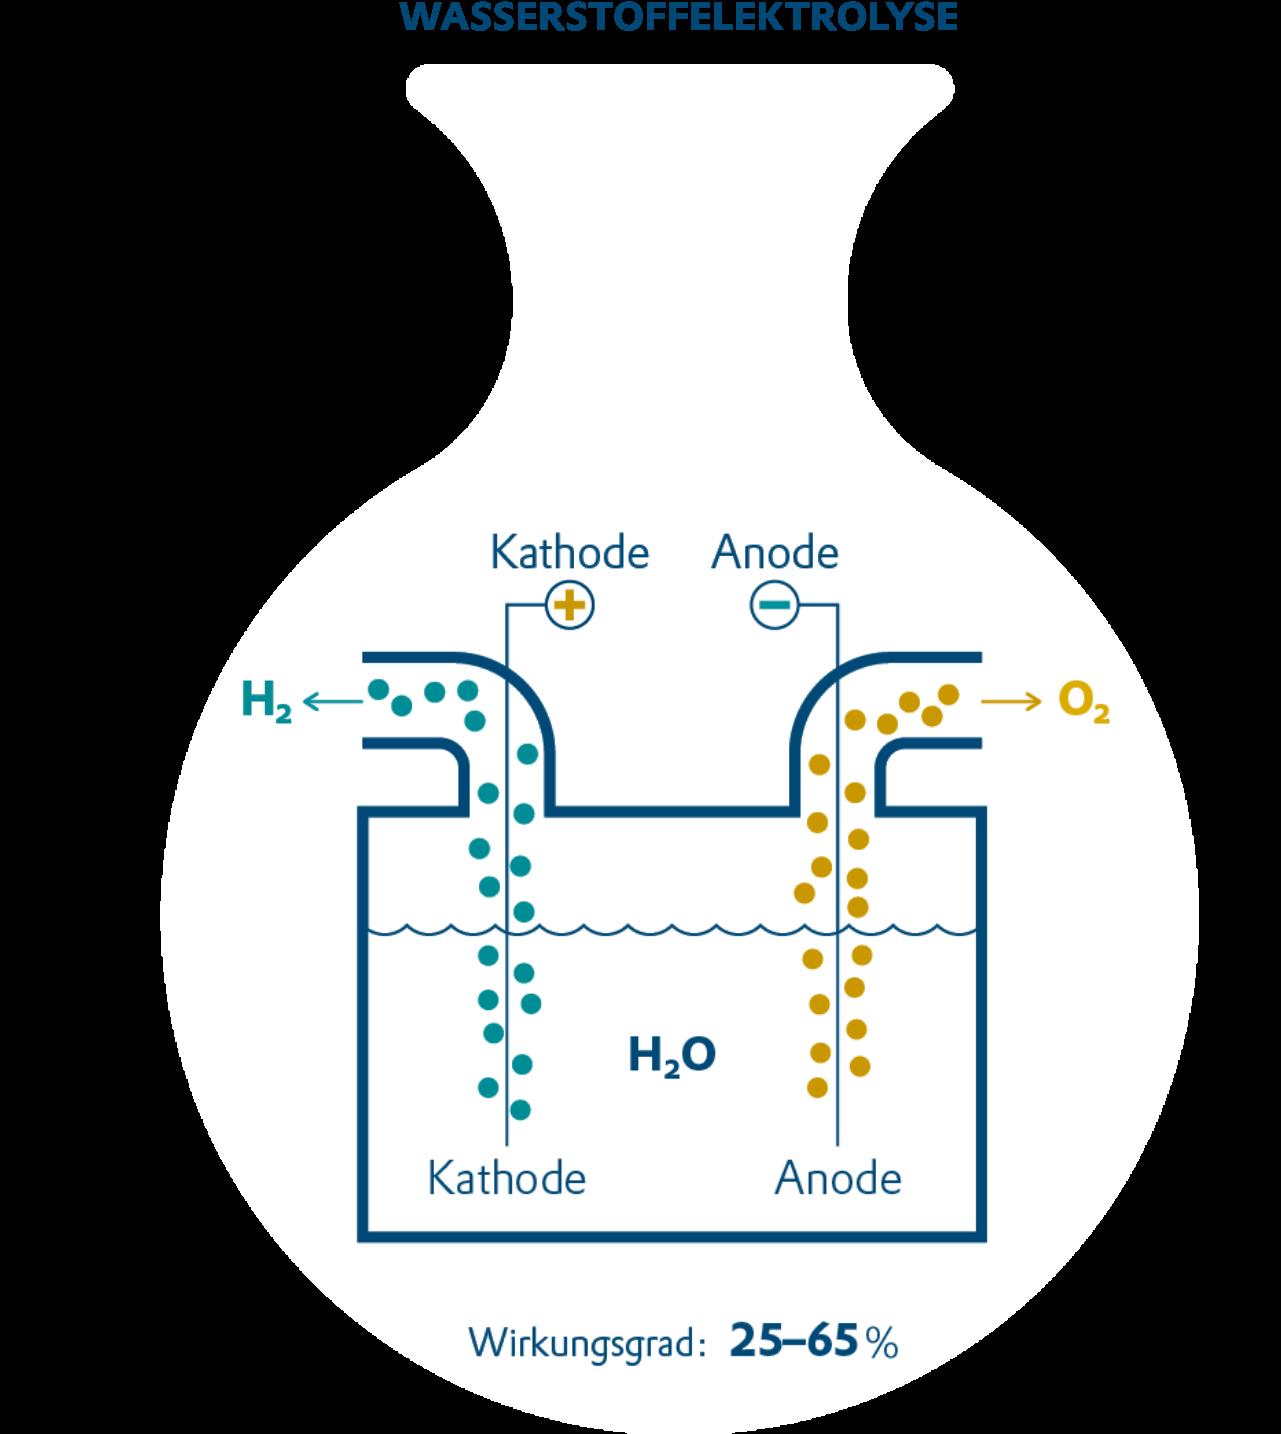 Wasserstoffelektrolyse